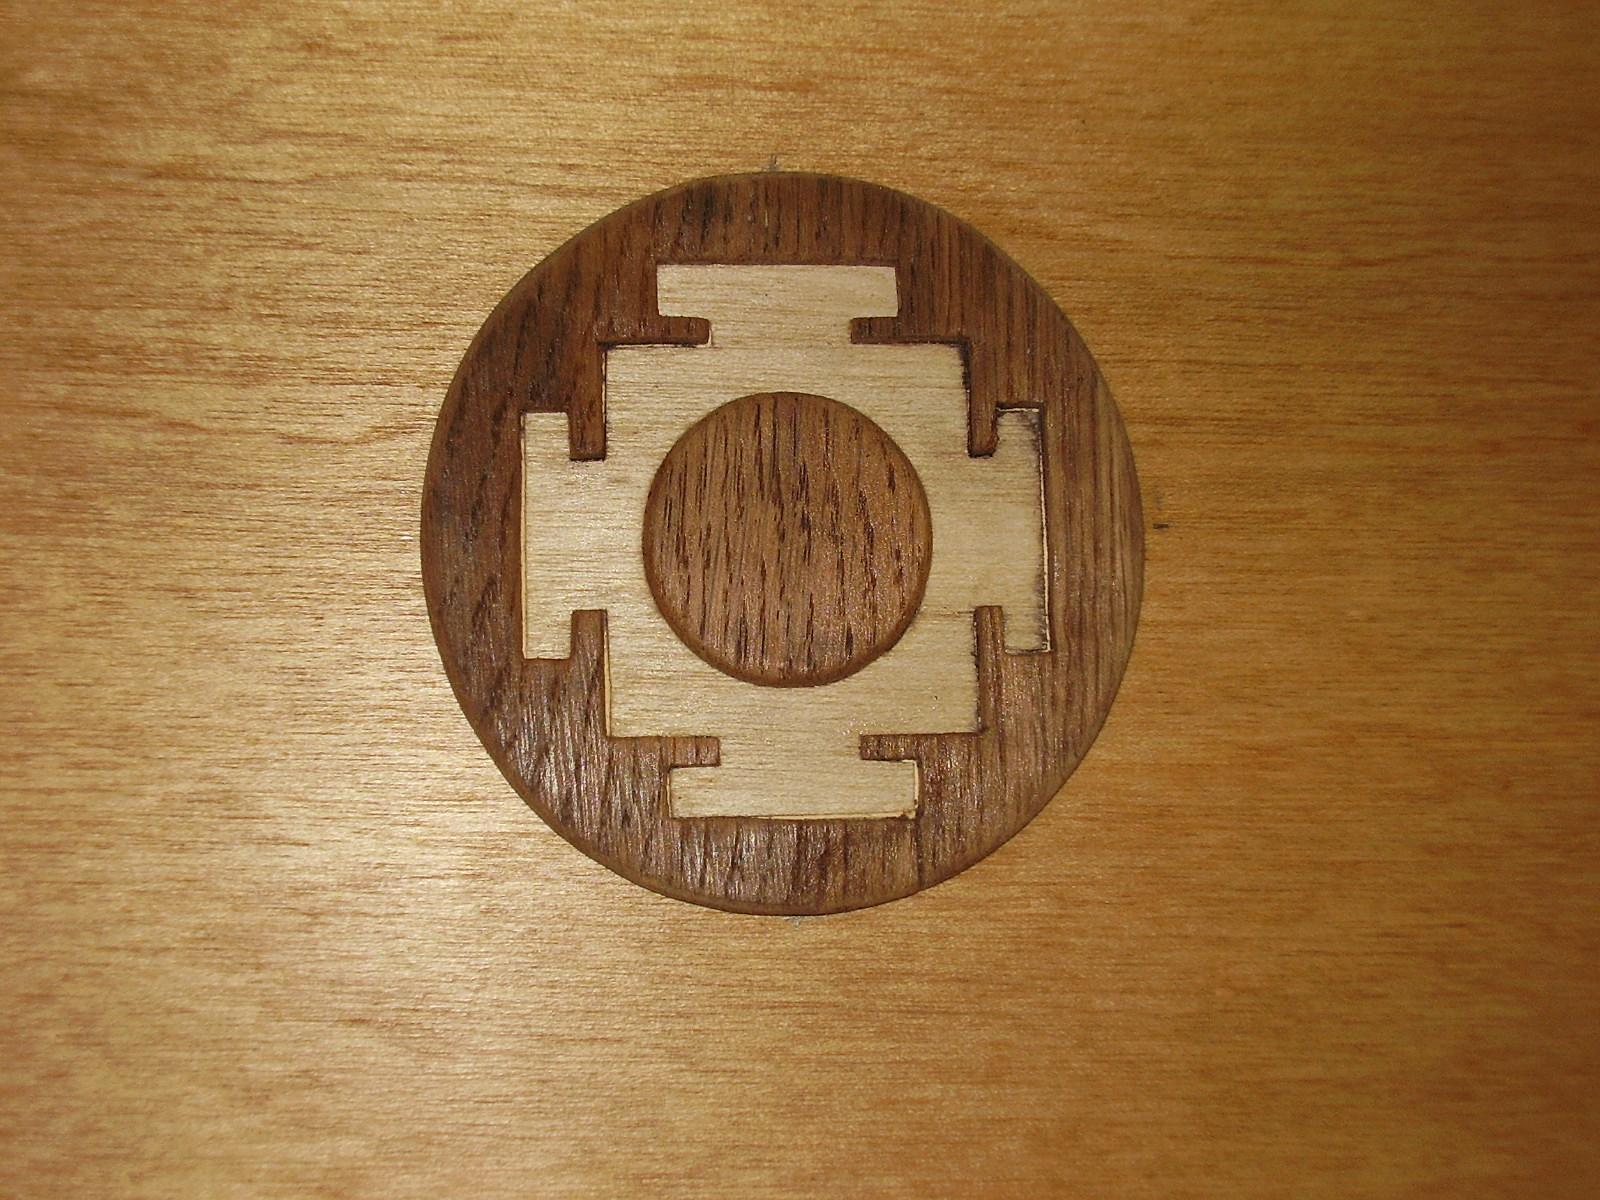 Muebles sensibles en madera cabezal de cama - Cabezal de madera ...